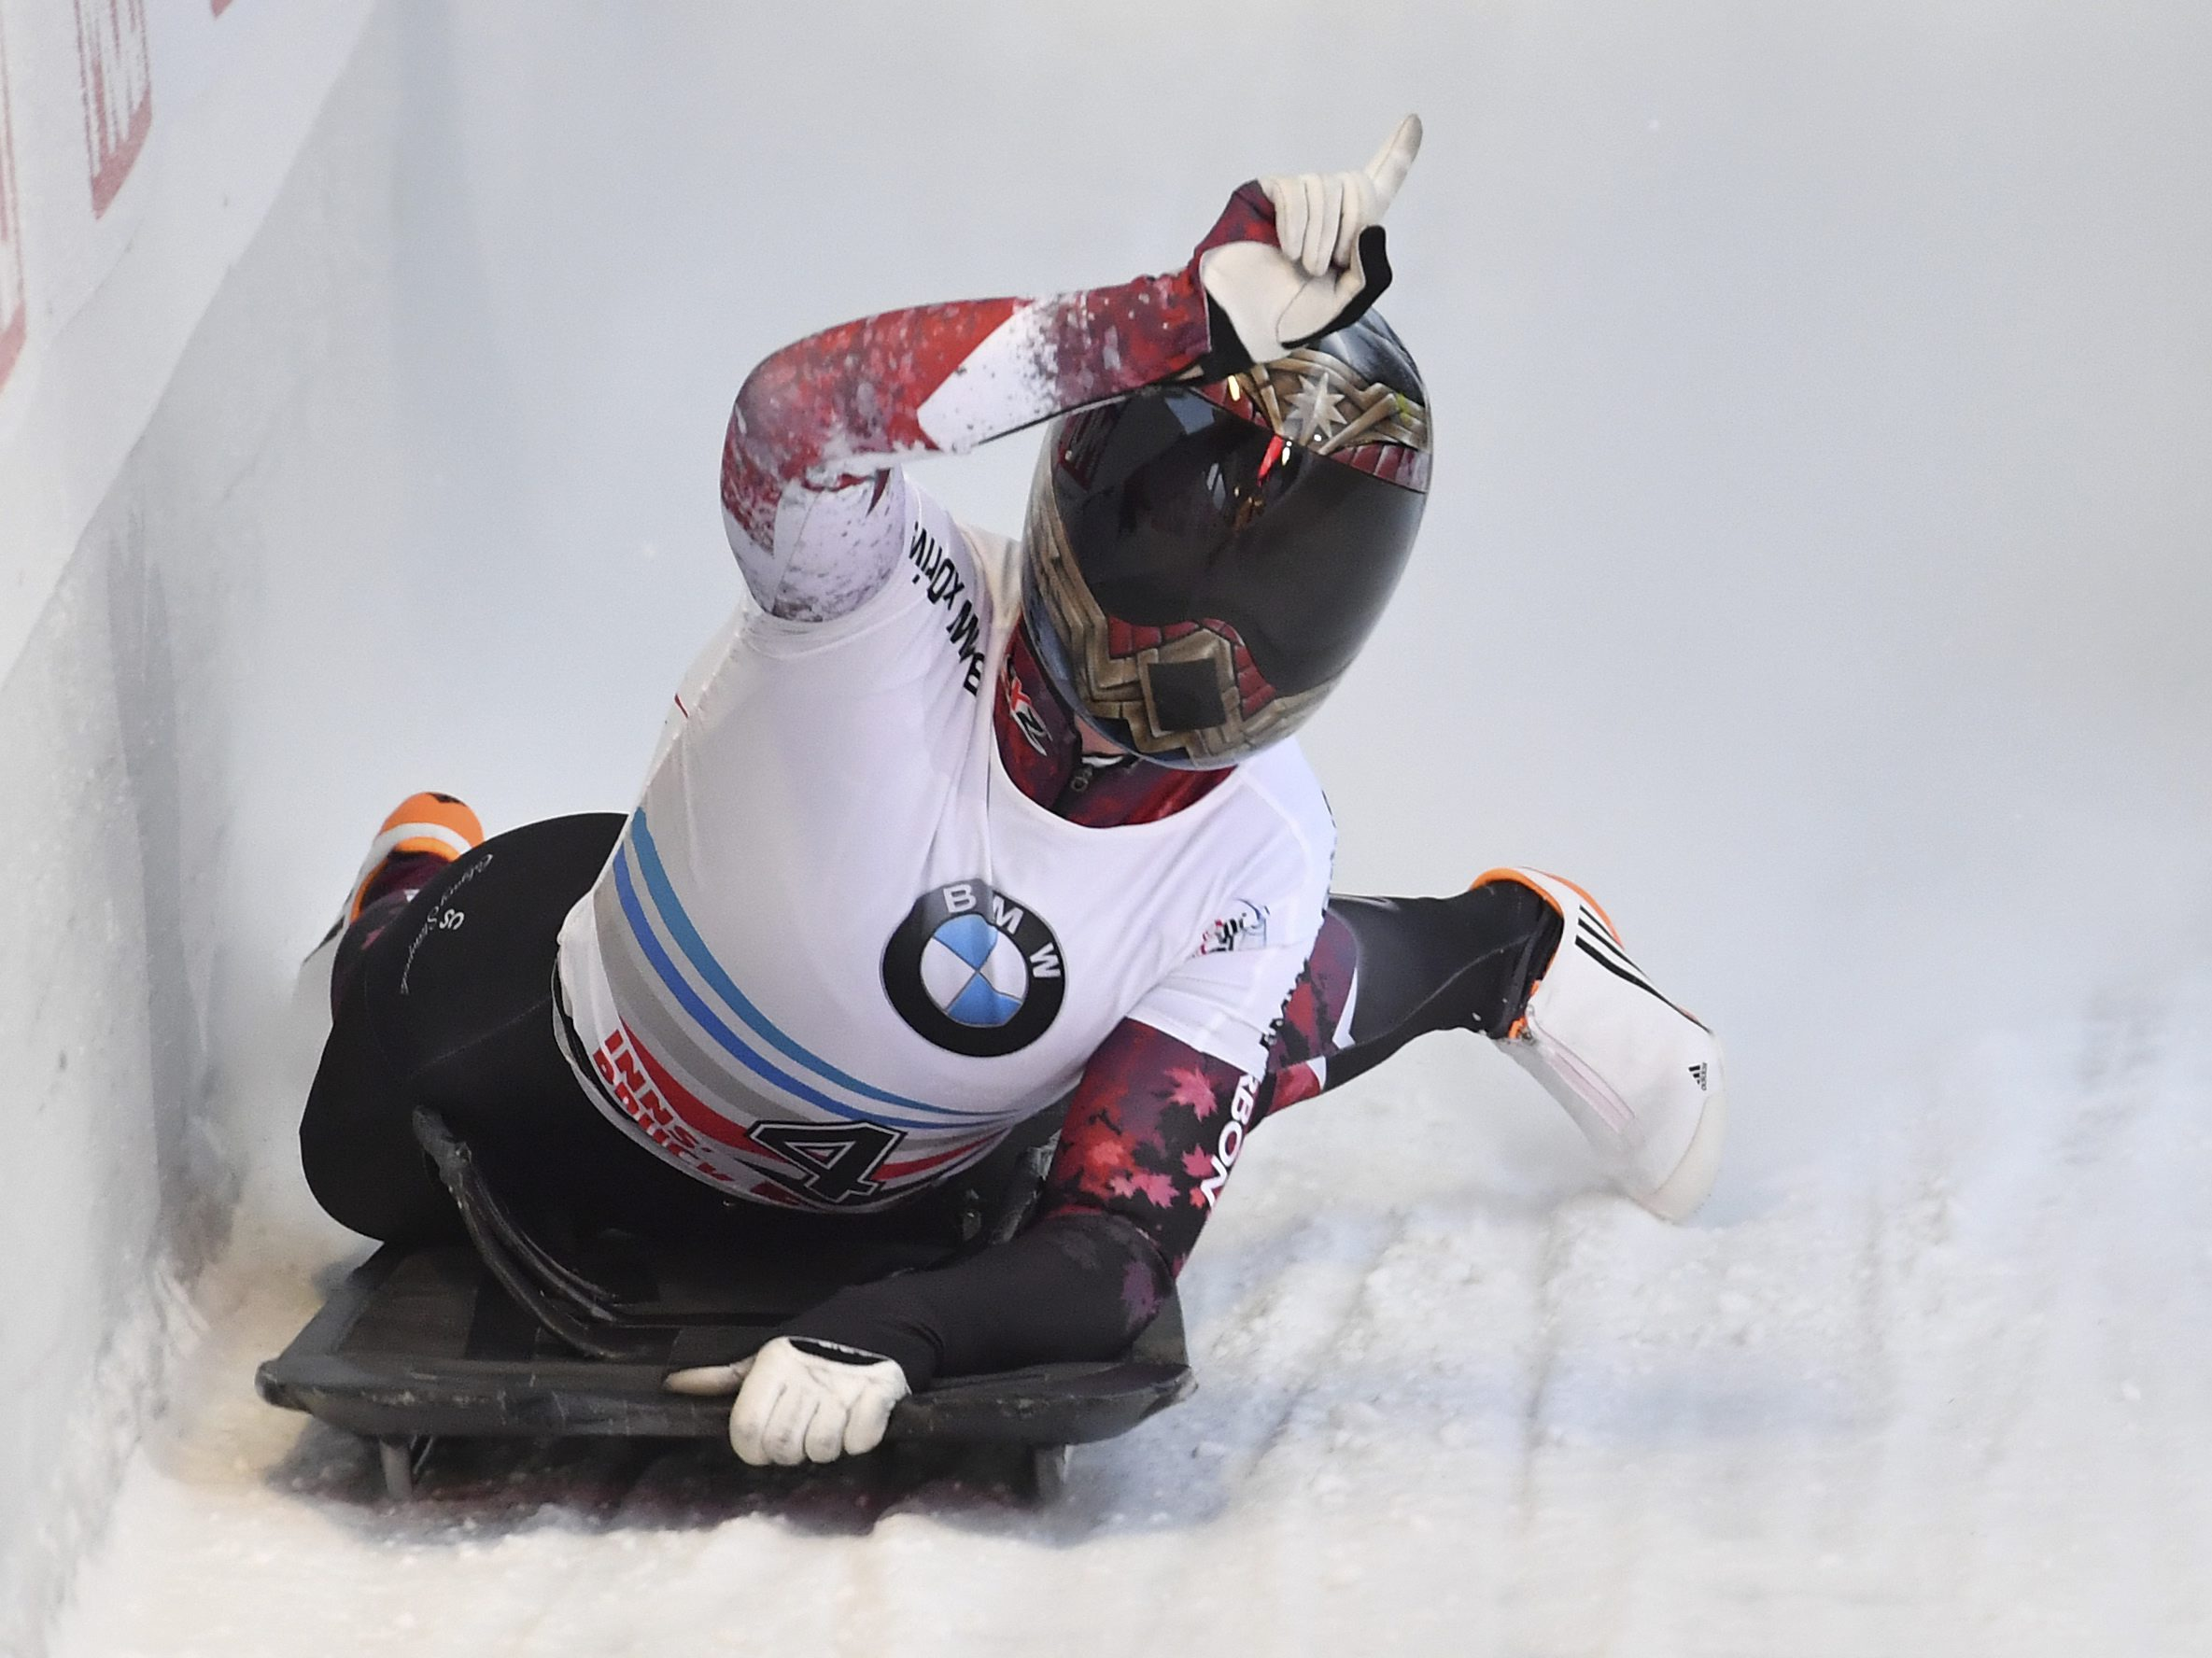 Team Canada Elisabeth Vathje